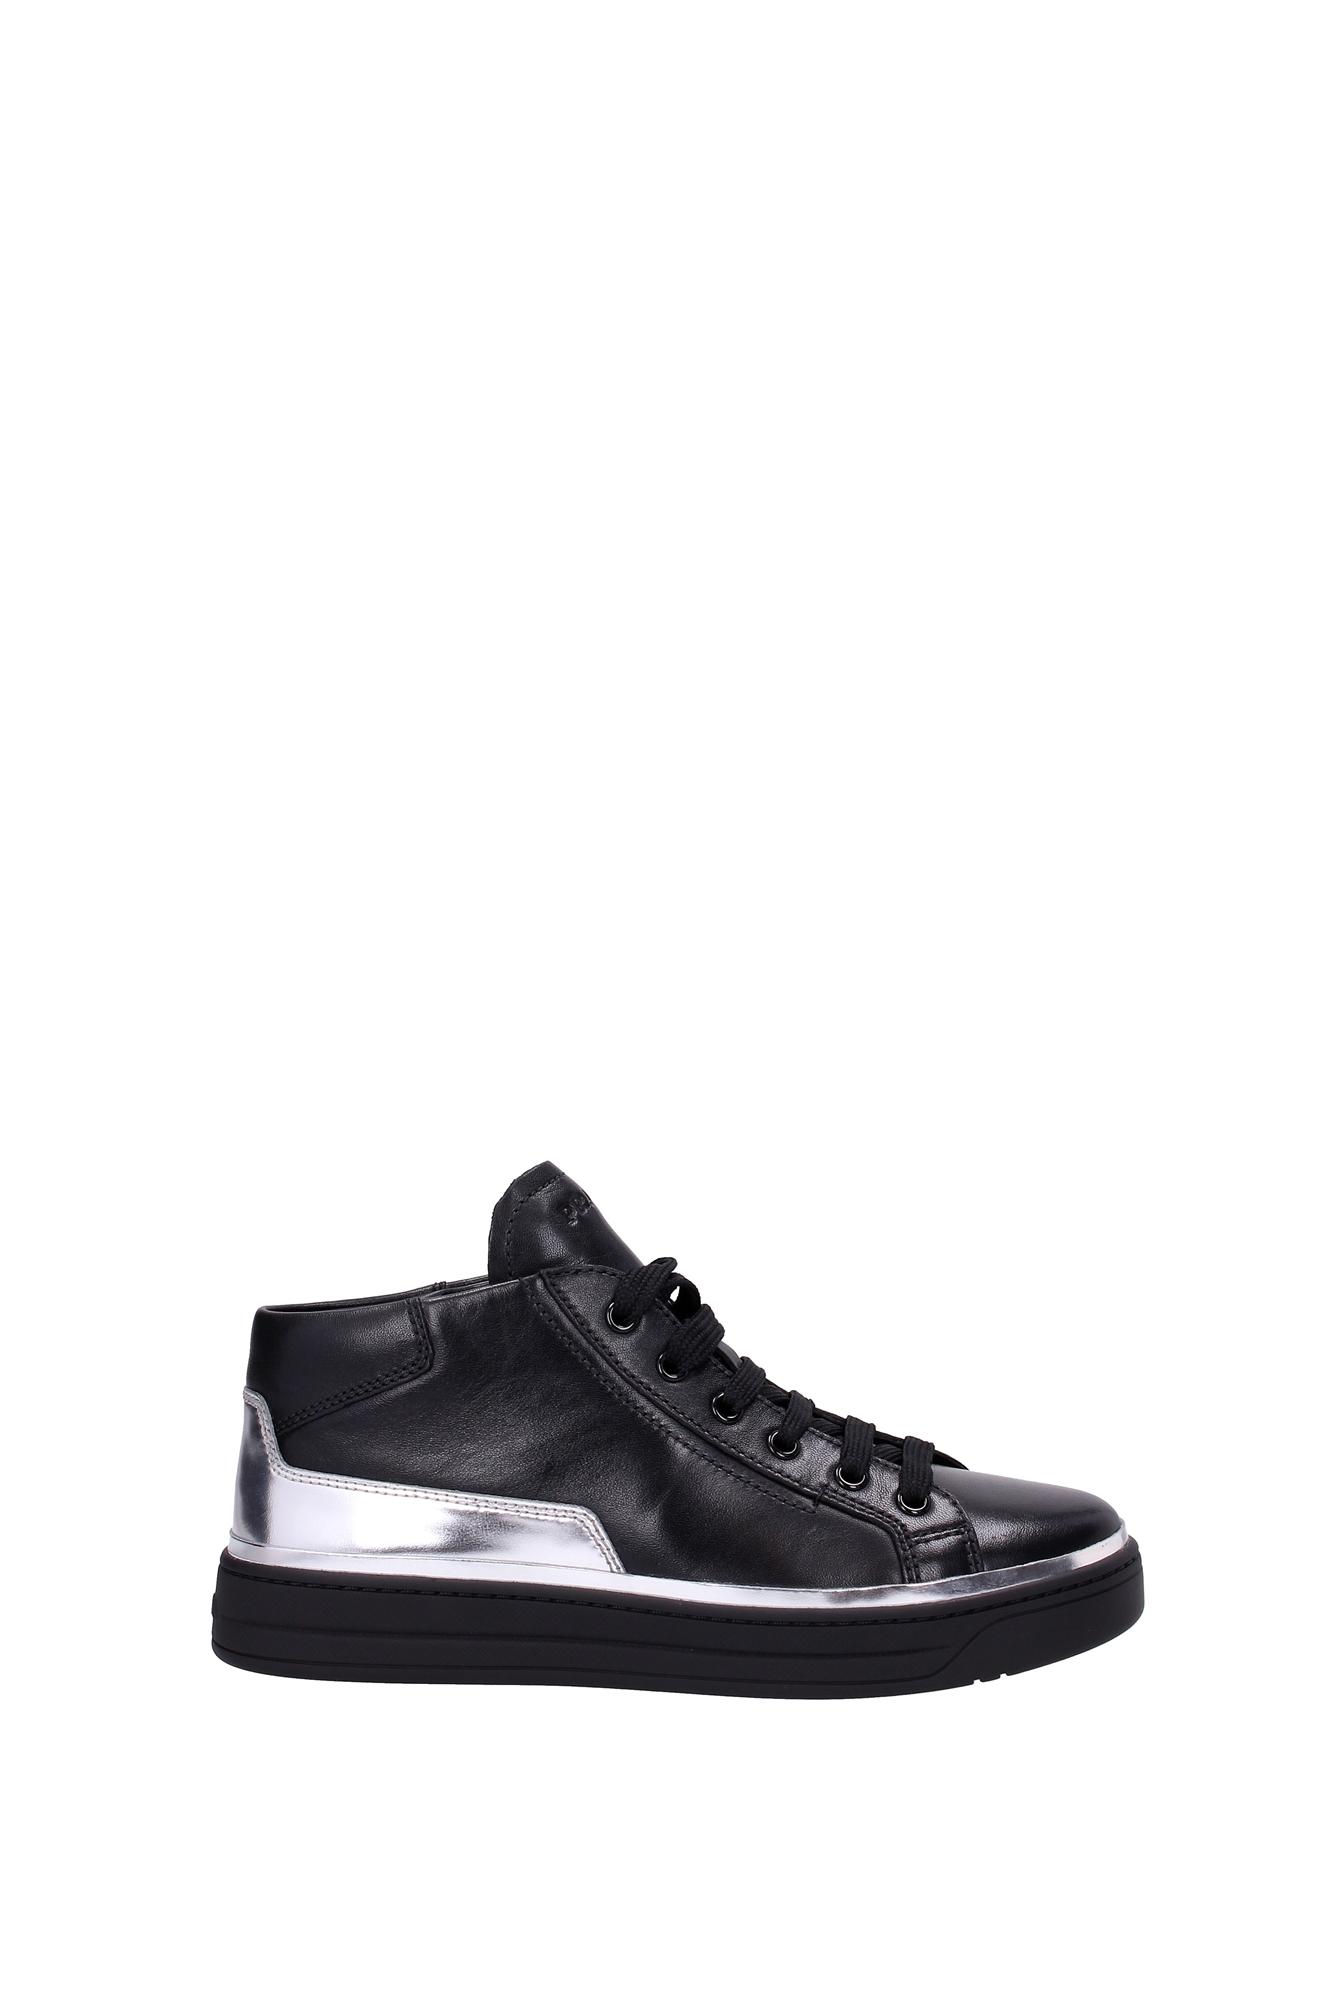 sneakers prada damen leder schwarz 3t6056nero ebay. Black Bedroom Furniture Sets. Home Design Ideas